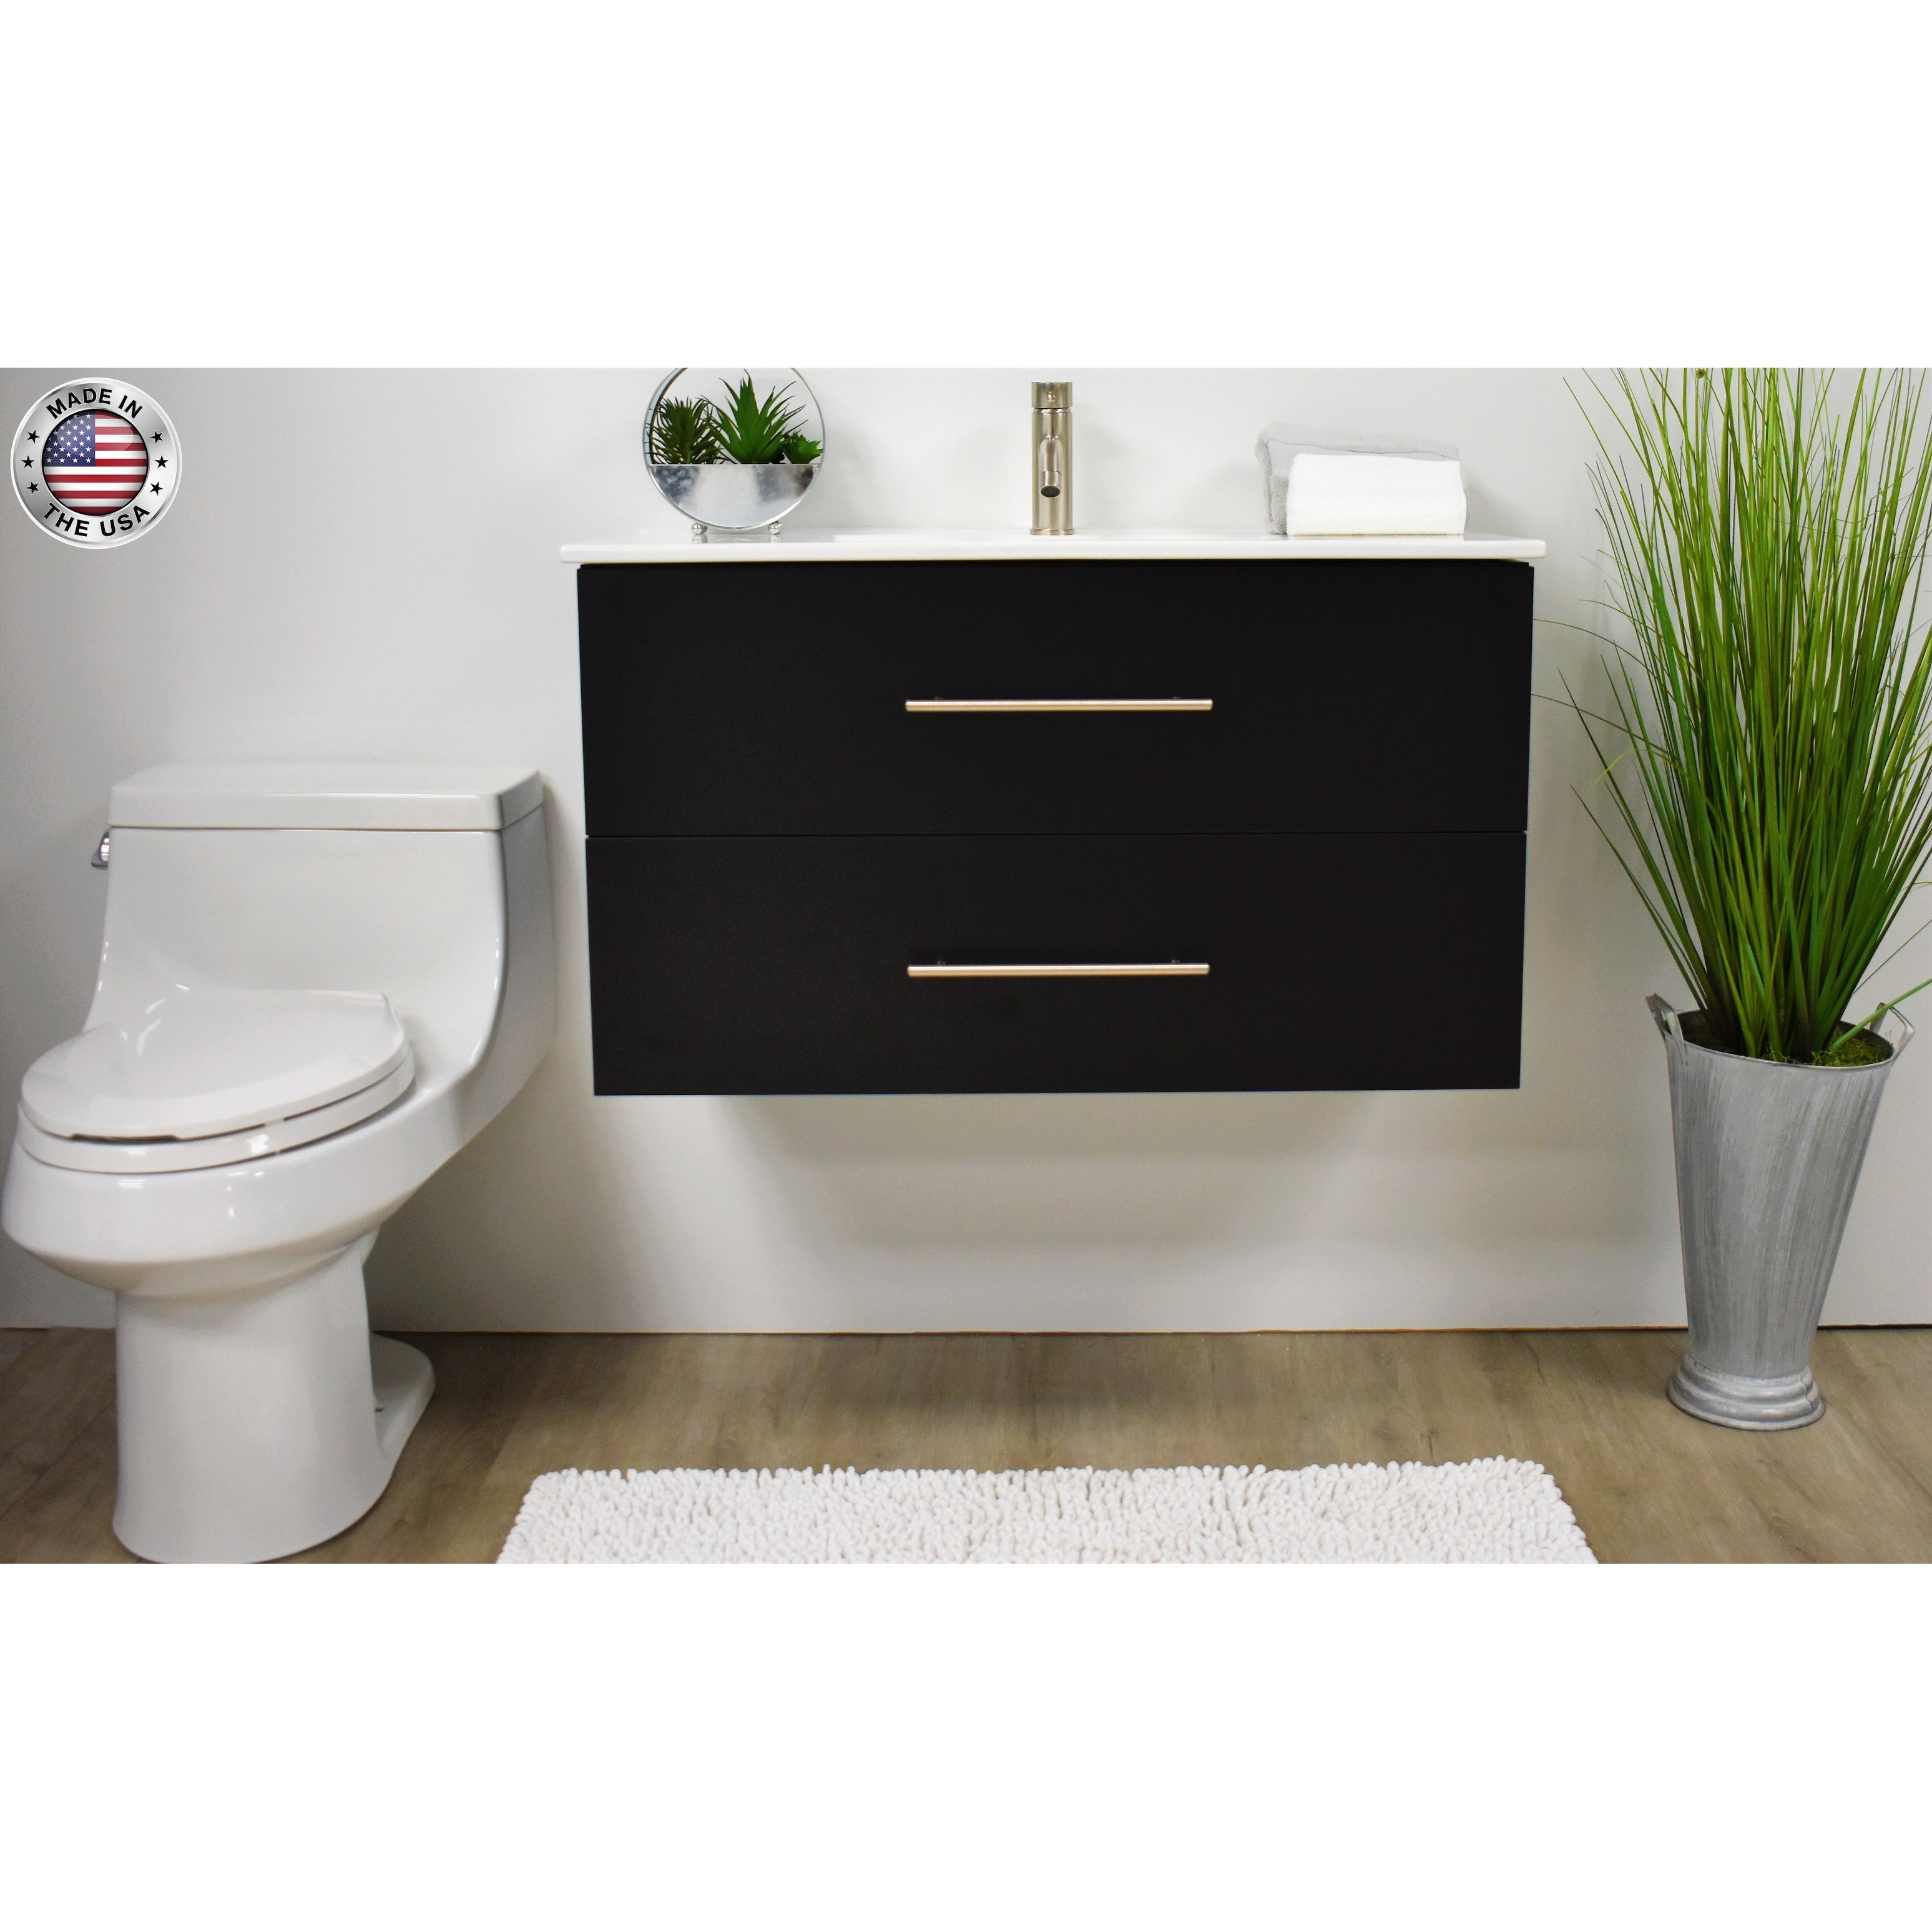 Volpa Usa Napa 36 Inch Black Wall Mounted Floating Bathroom Vanity Set Overstock 32207294